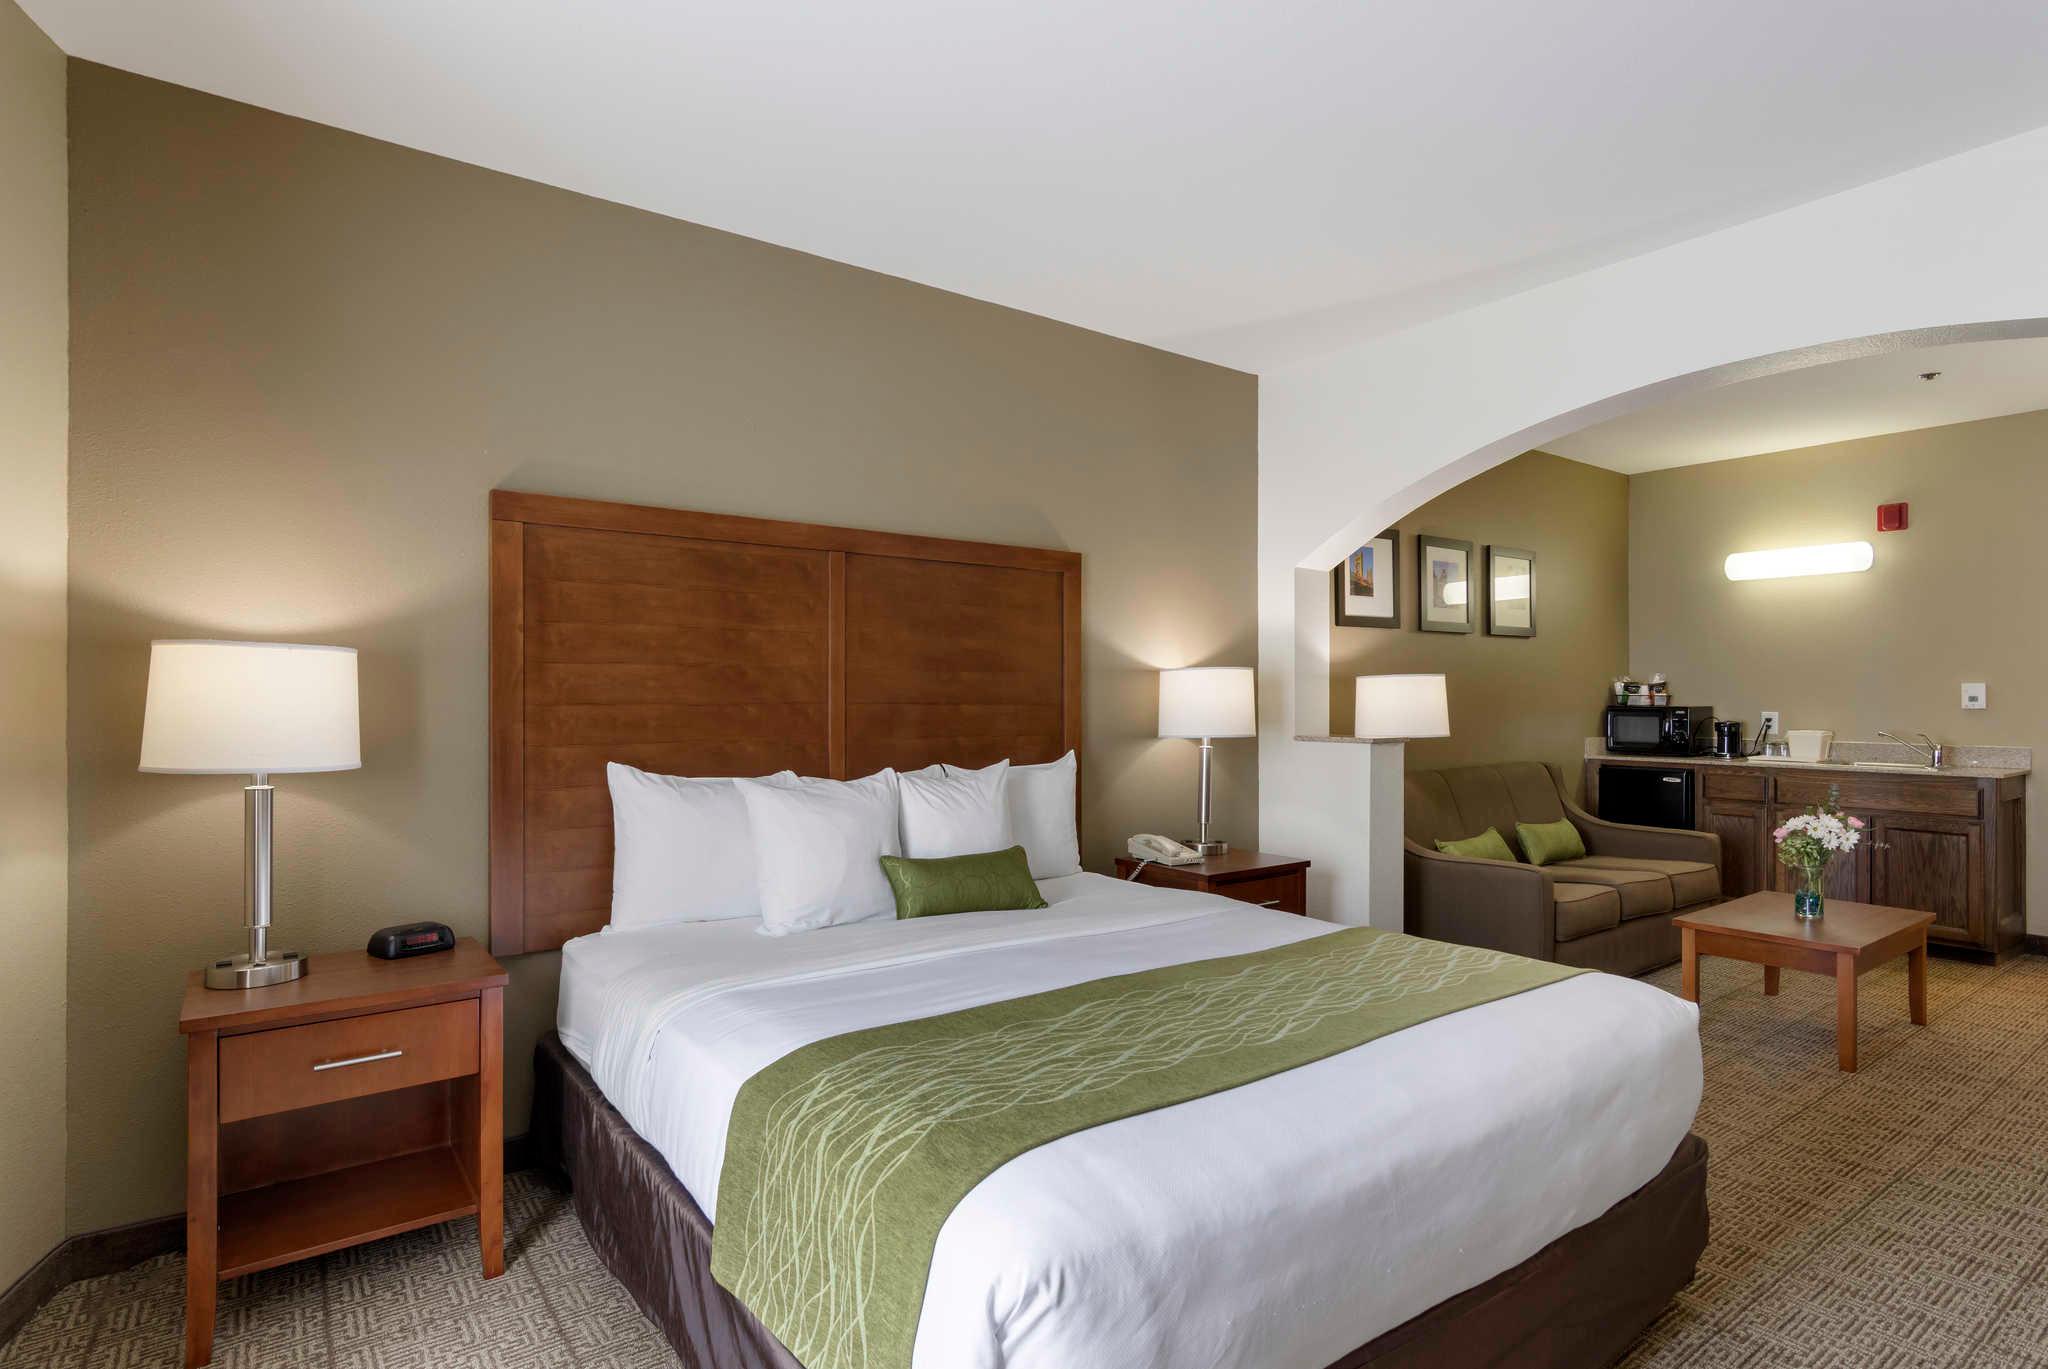 Comfort Inn & Suites Sacramento - University Area image 22